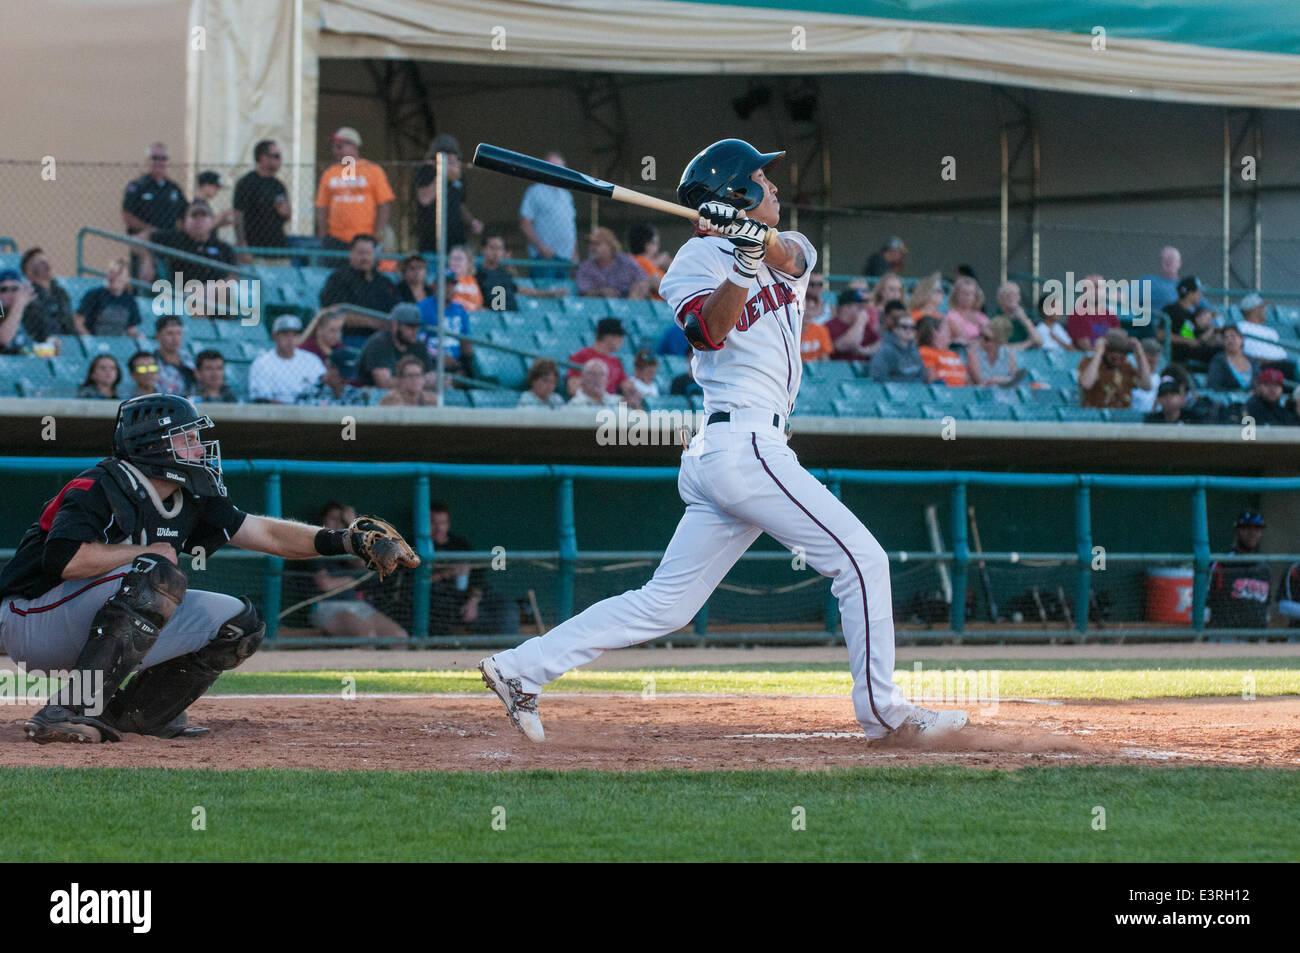 Lancaster, California, USA. 27 June 2014, Lancaster Municipal Stadium, Lancaster, CA. Houston Astros prospect ChanJong - Stock Image